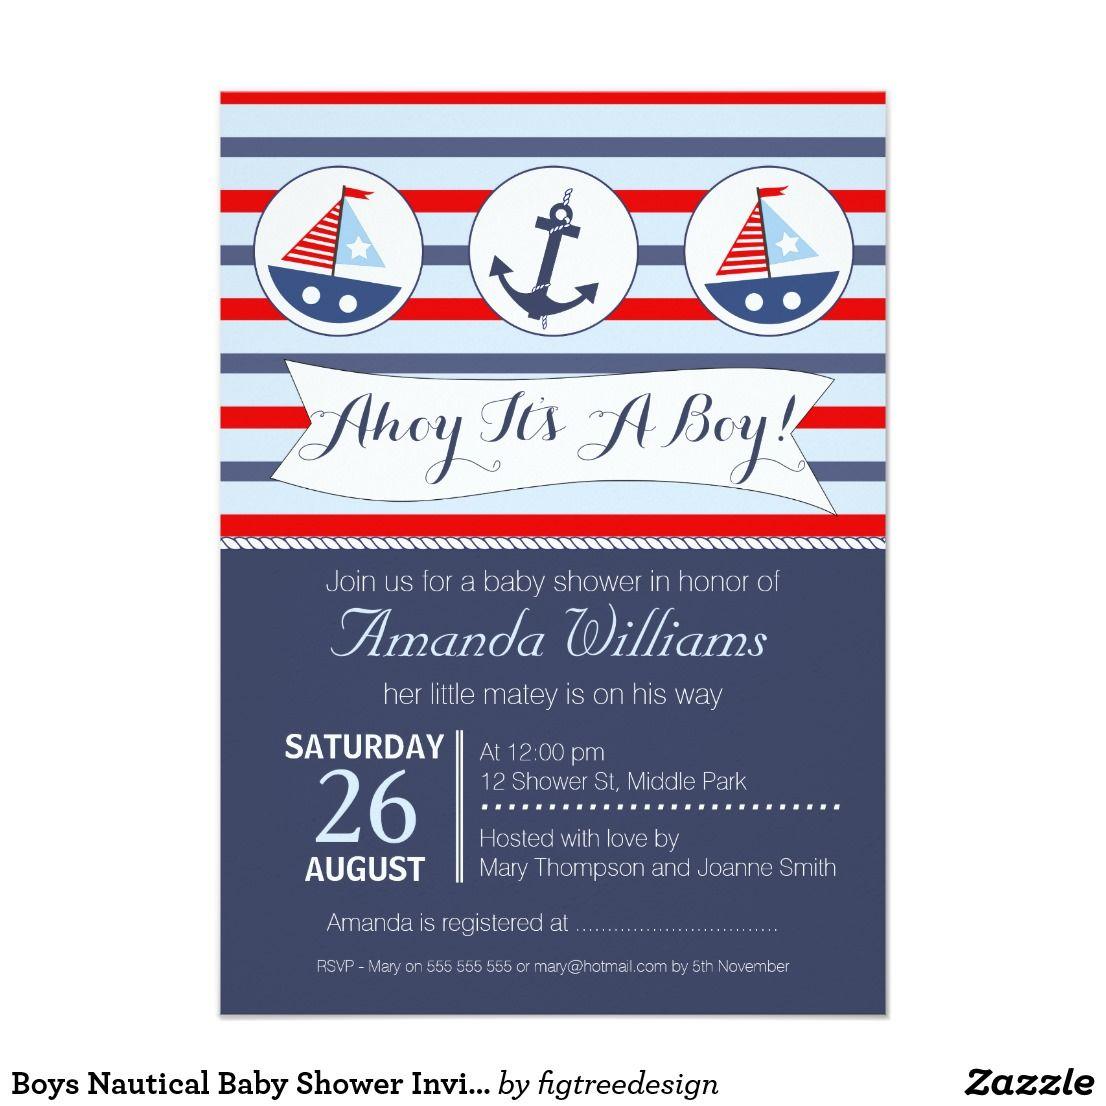 Boys Nautical Baby Shower Invitation | Shower invitations